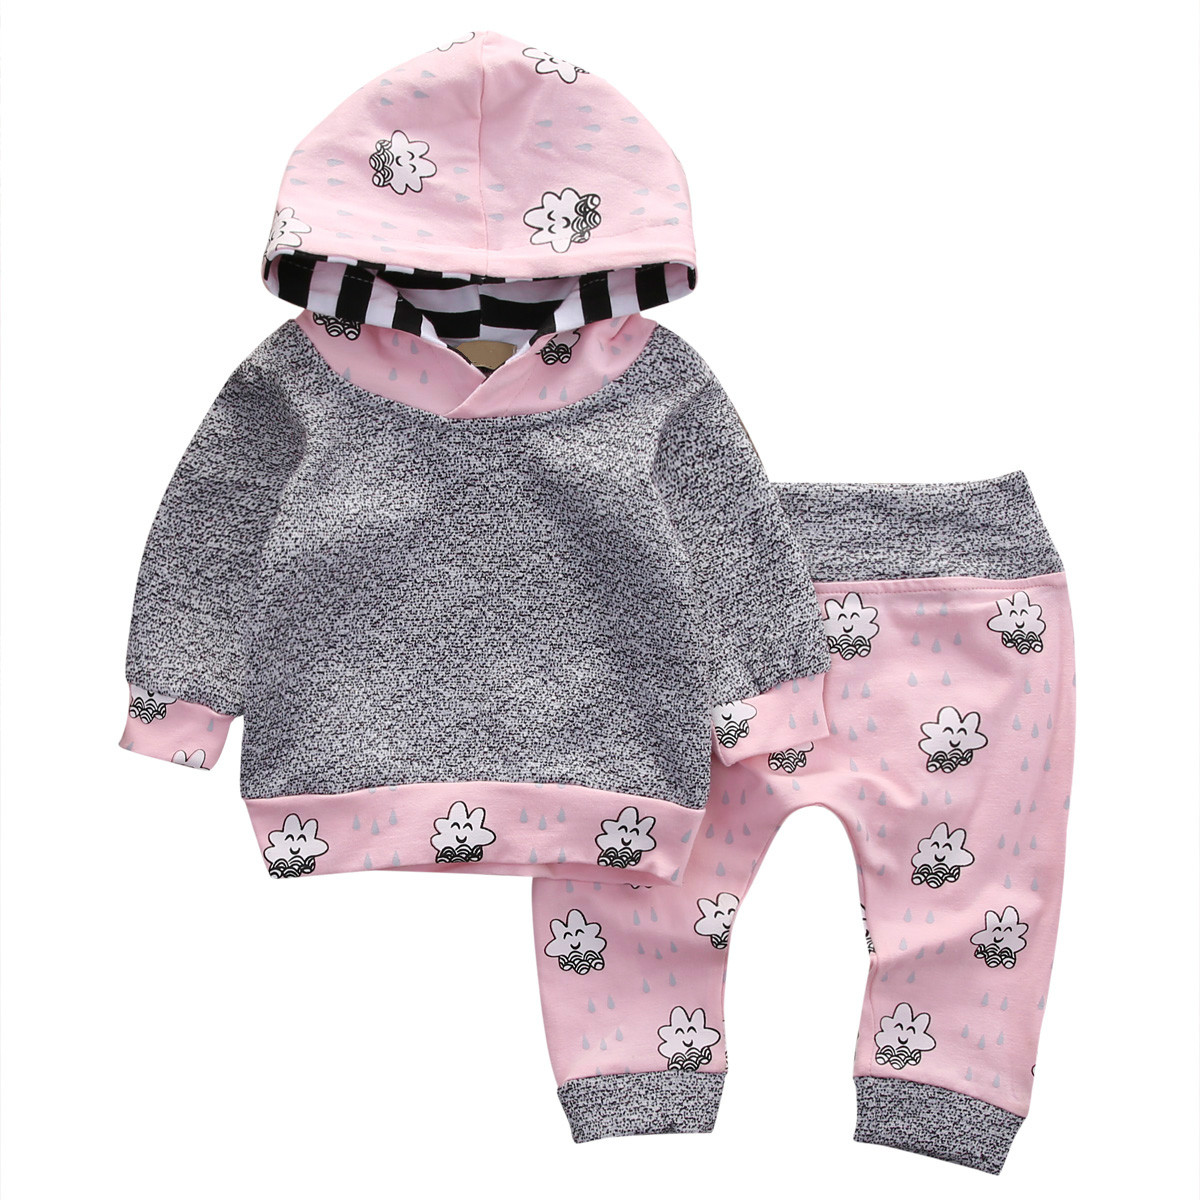 2018 New Lovely 2pcs Newborn Baby Boys Girls Cute Long Sleeve Hooded T-shirt Tops Hoodie Legging Pants 2Pcs Outfits Set 0-24M